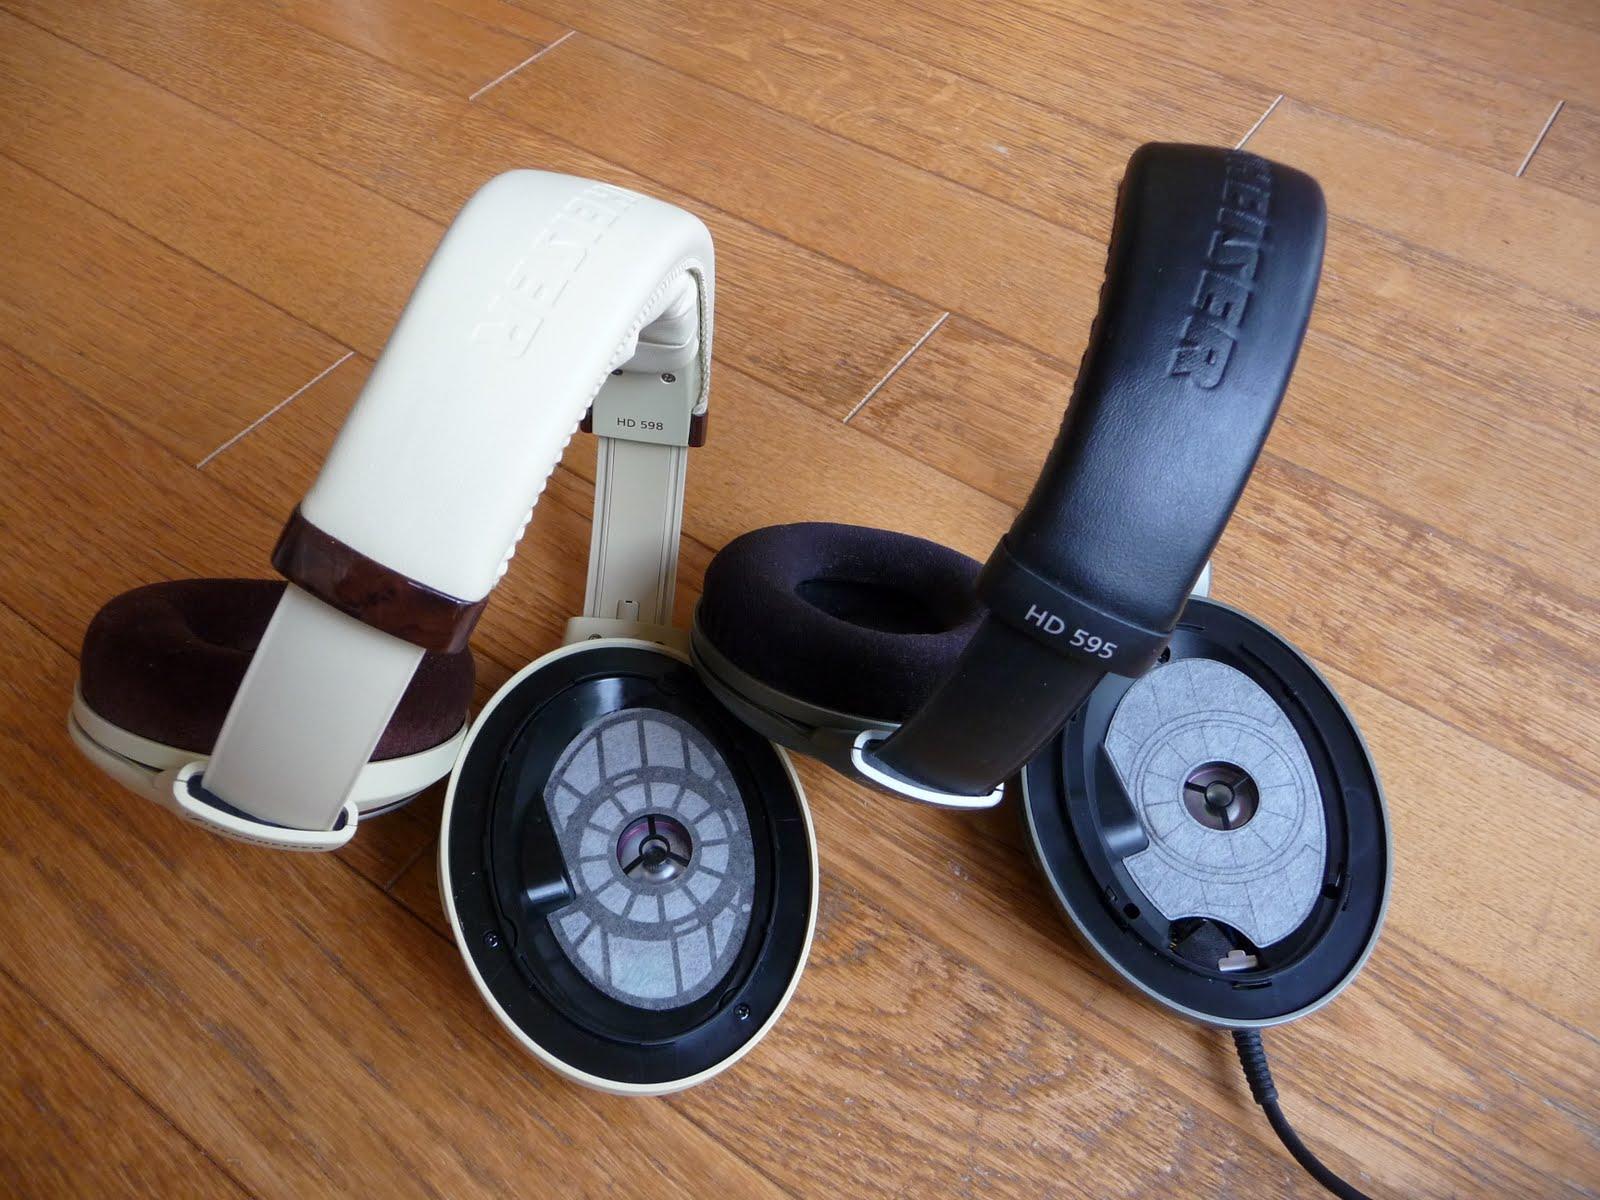 test casque hi fi sennheiser hd598 l 39 volution d 39 un grand classique audiophile on mag. Black Bedroom Furniture Sets. Home Design Ideas